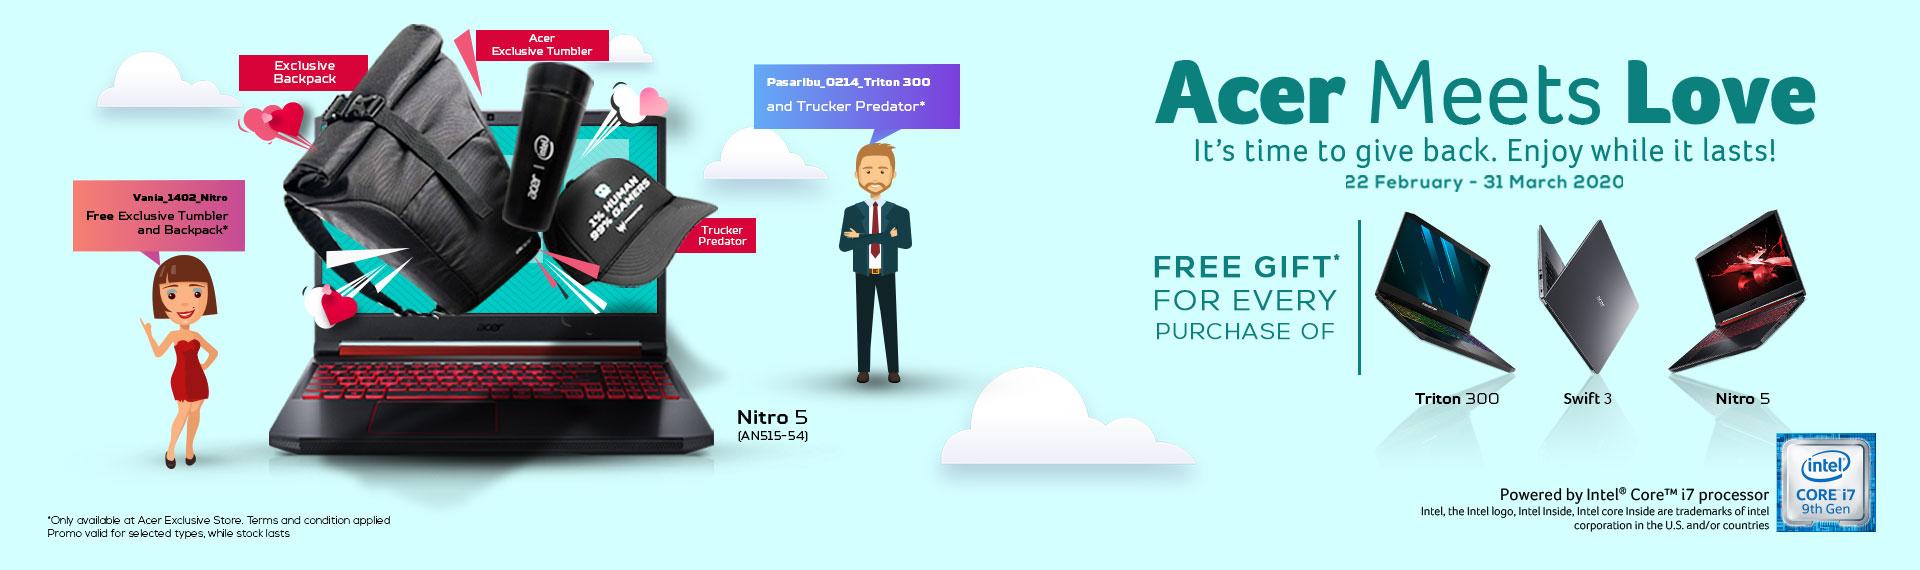 Dapatkan Exclusive Gift Lewat Promo Laptop Acer Meets Love!